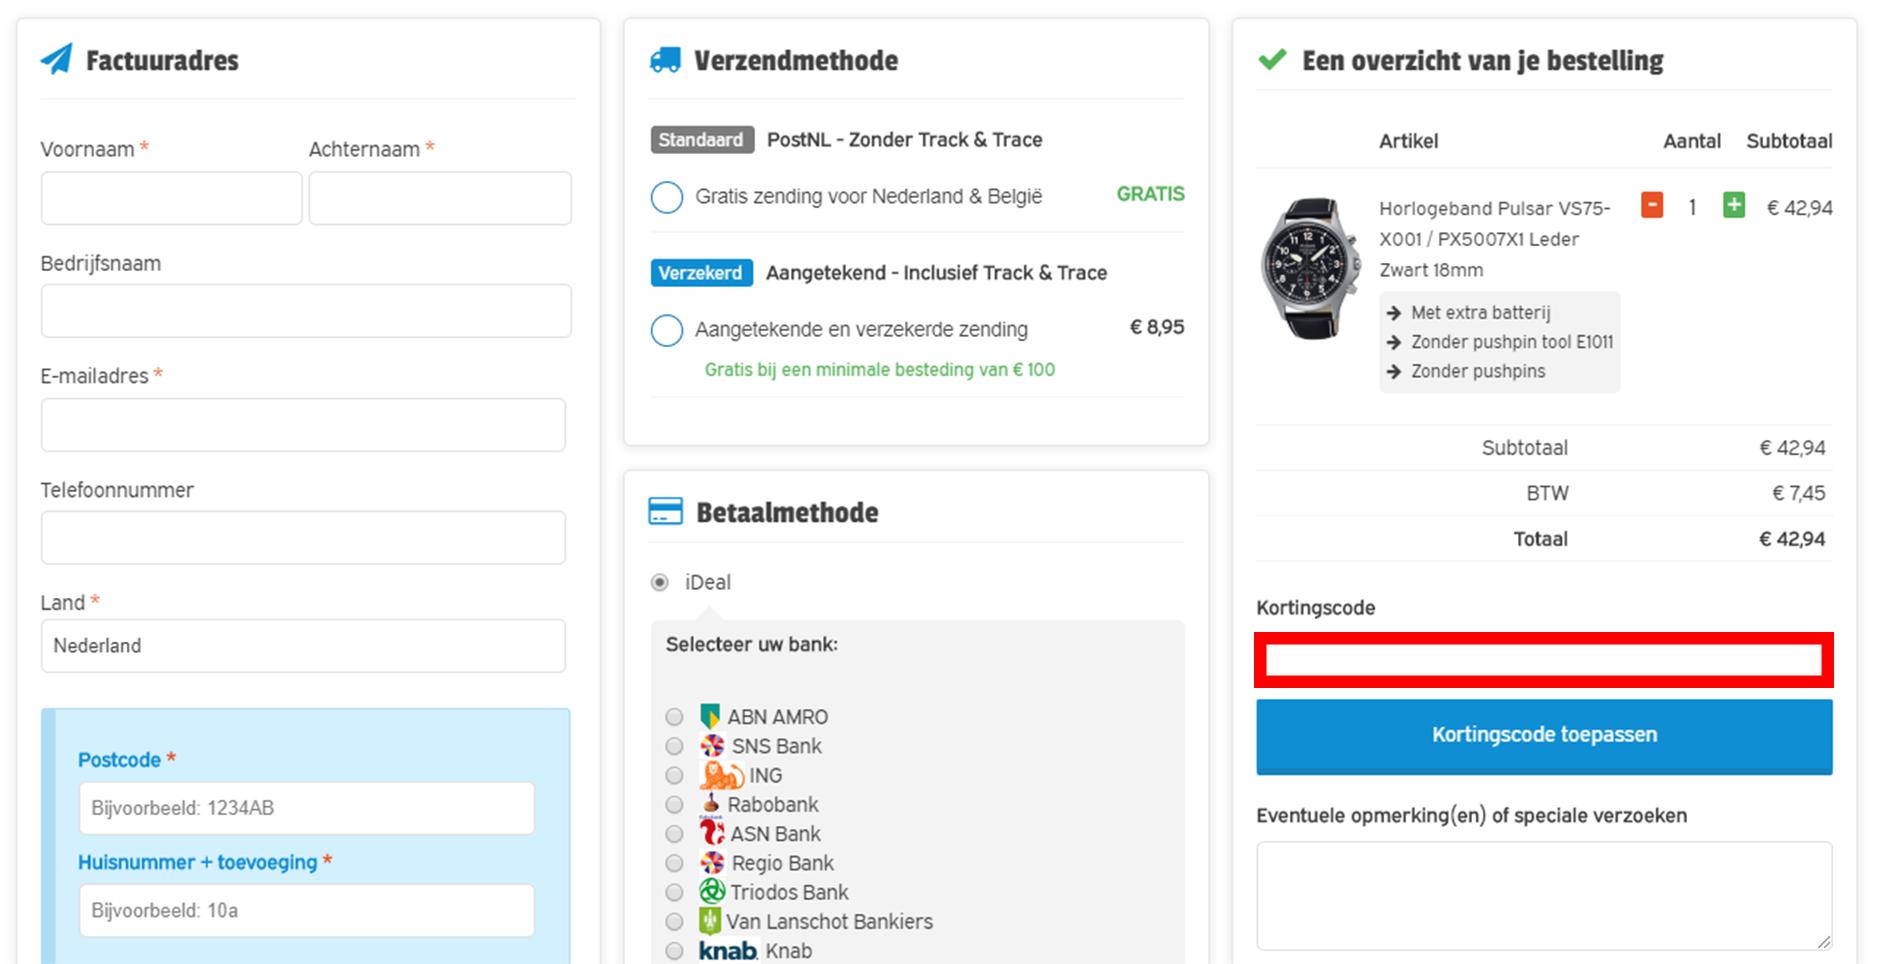 Horloge-bandjes.nl kortingscode gebruiken